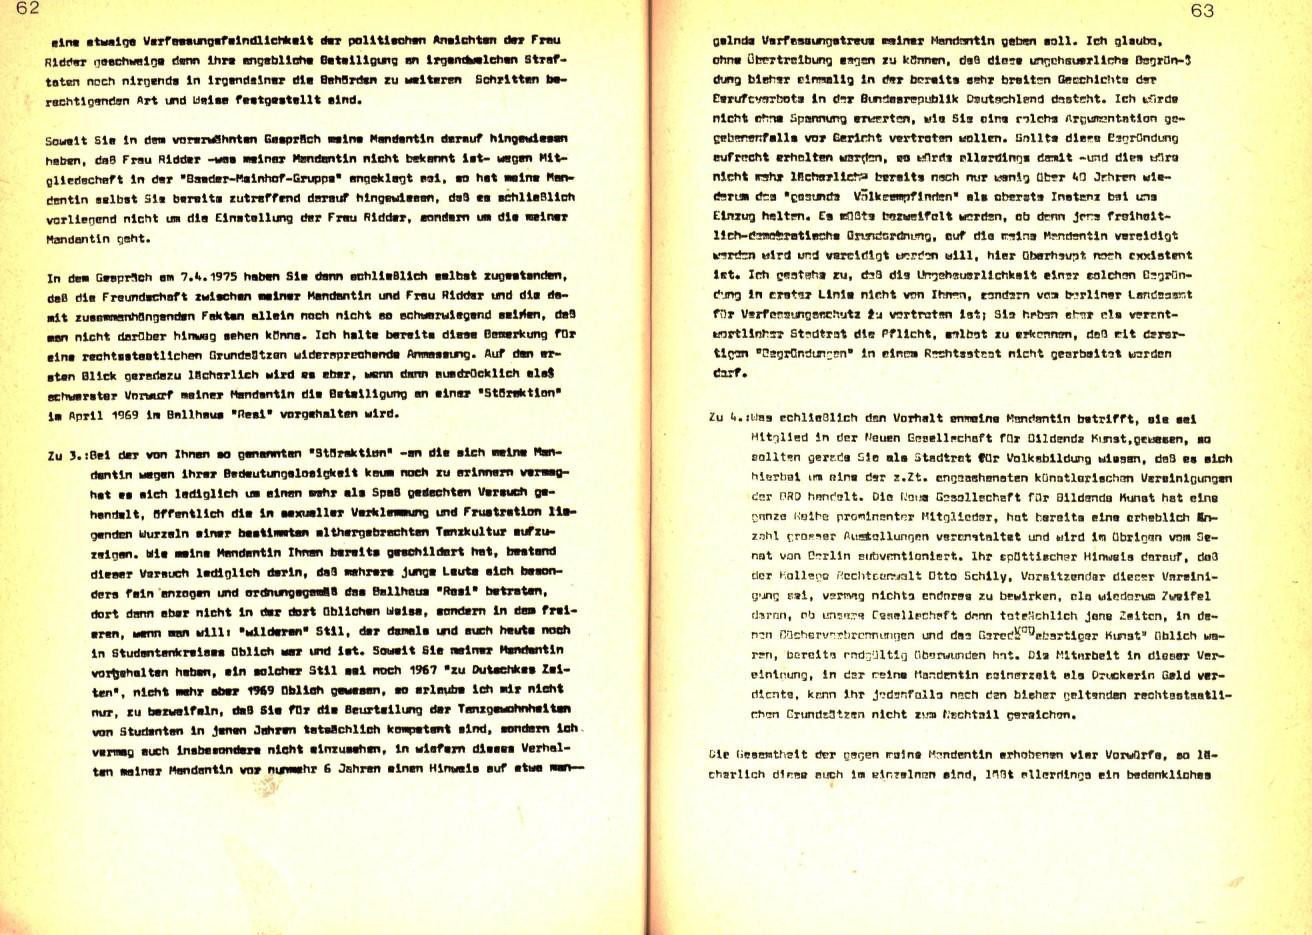 Berlin_VDS_Aktionskomitee_1975_BerufsverboteII_33